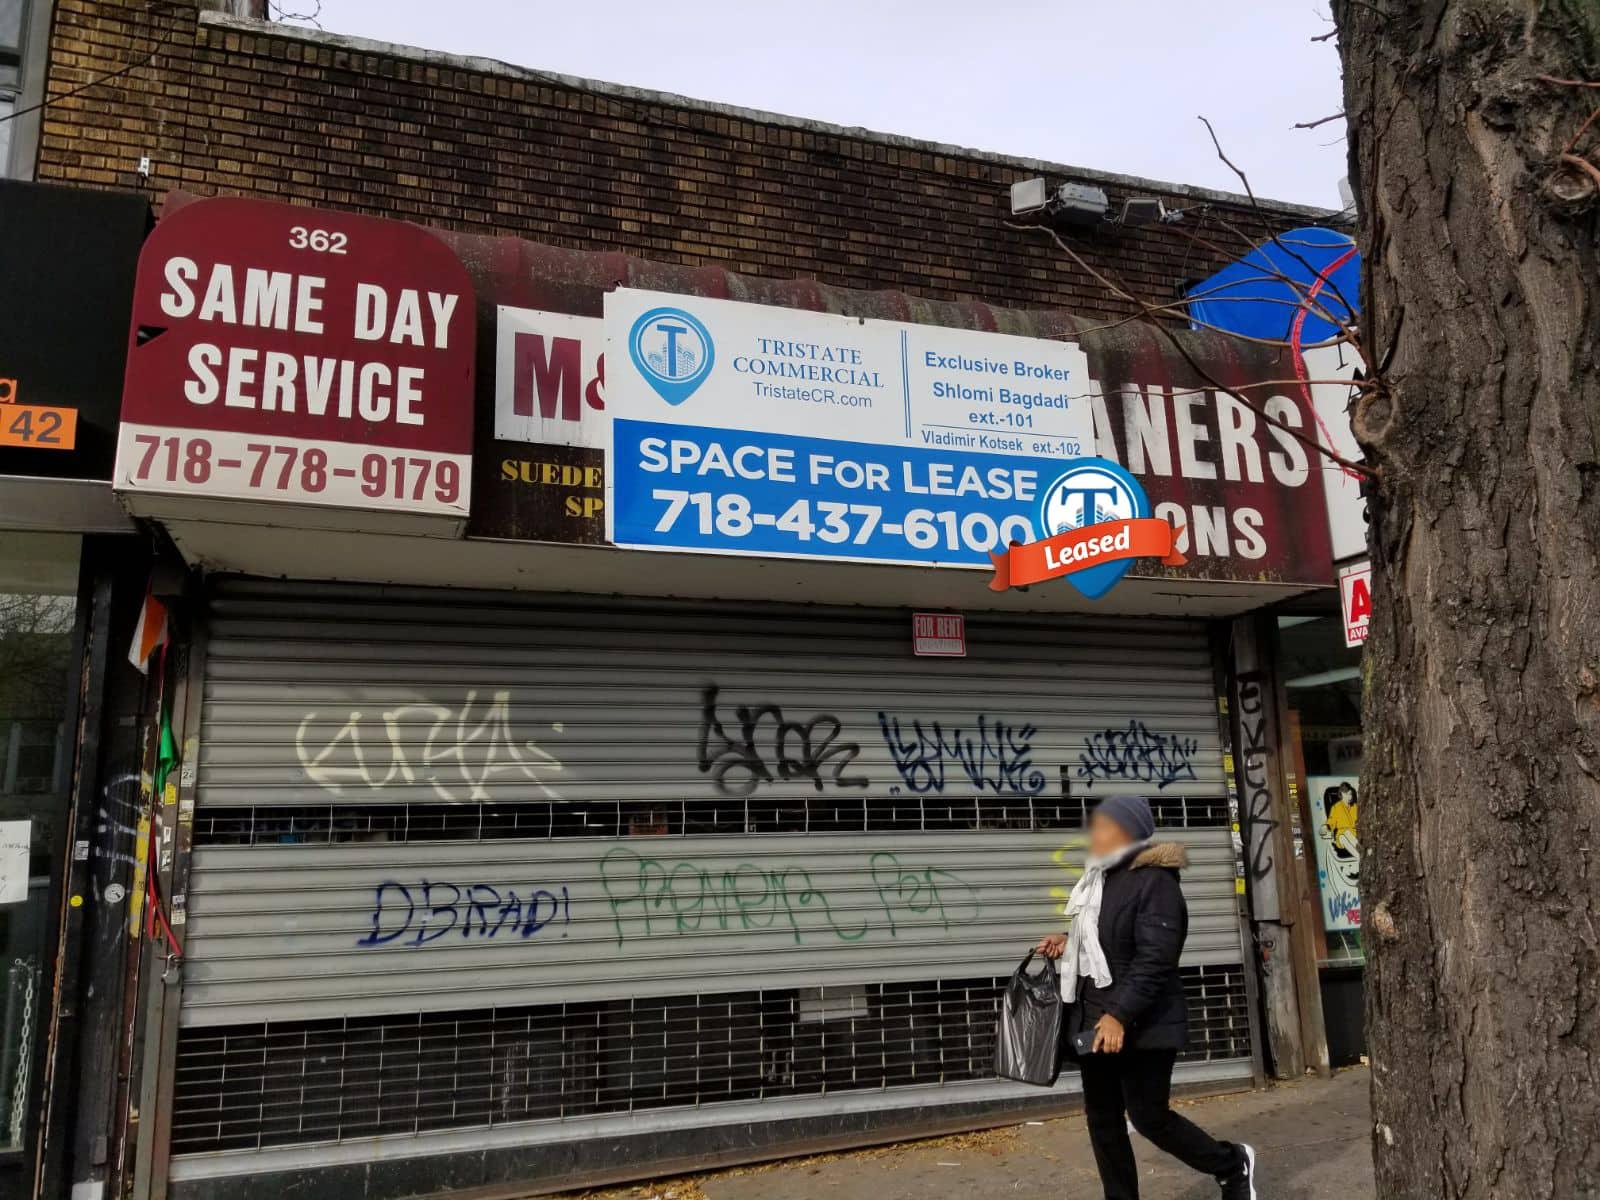 Coney Island Ave Walgreens